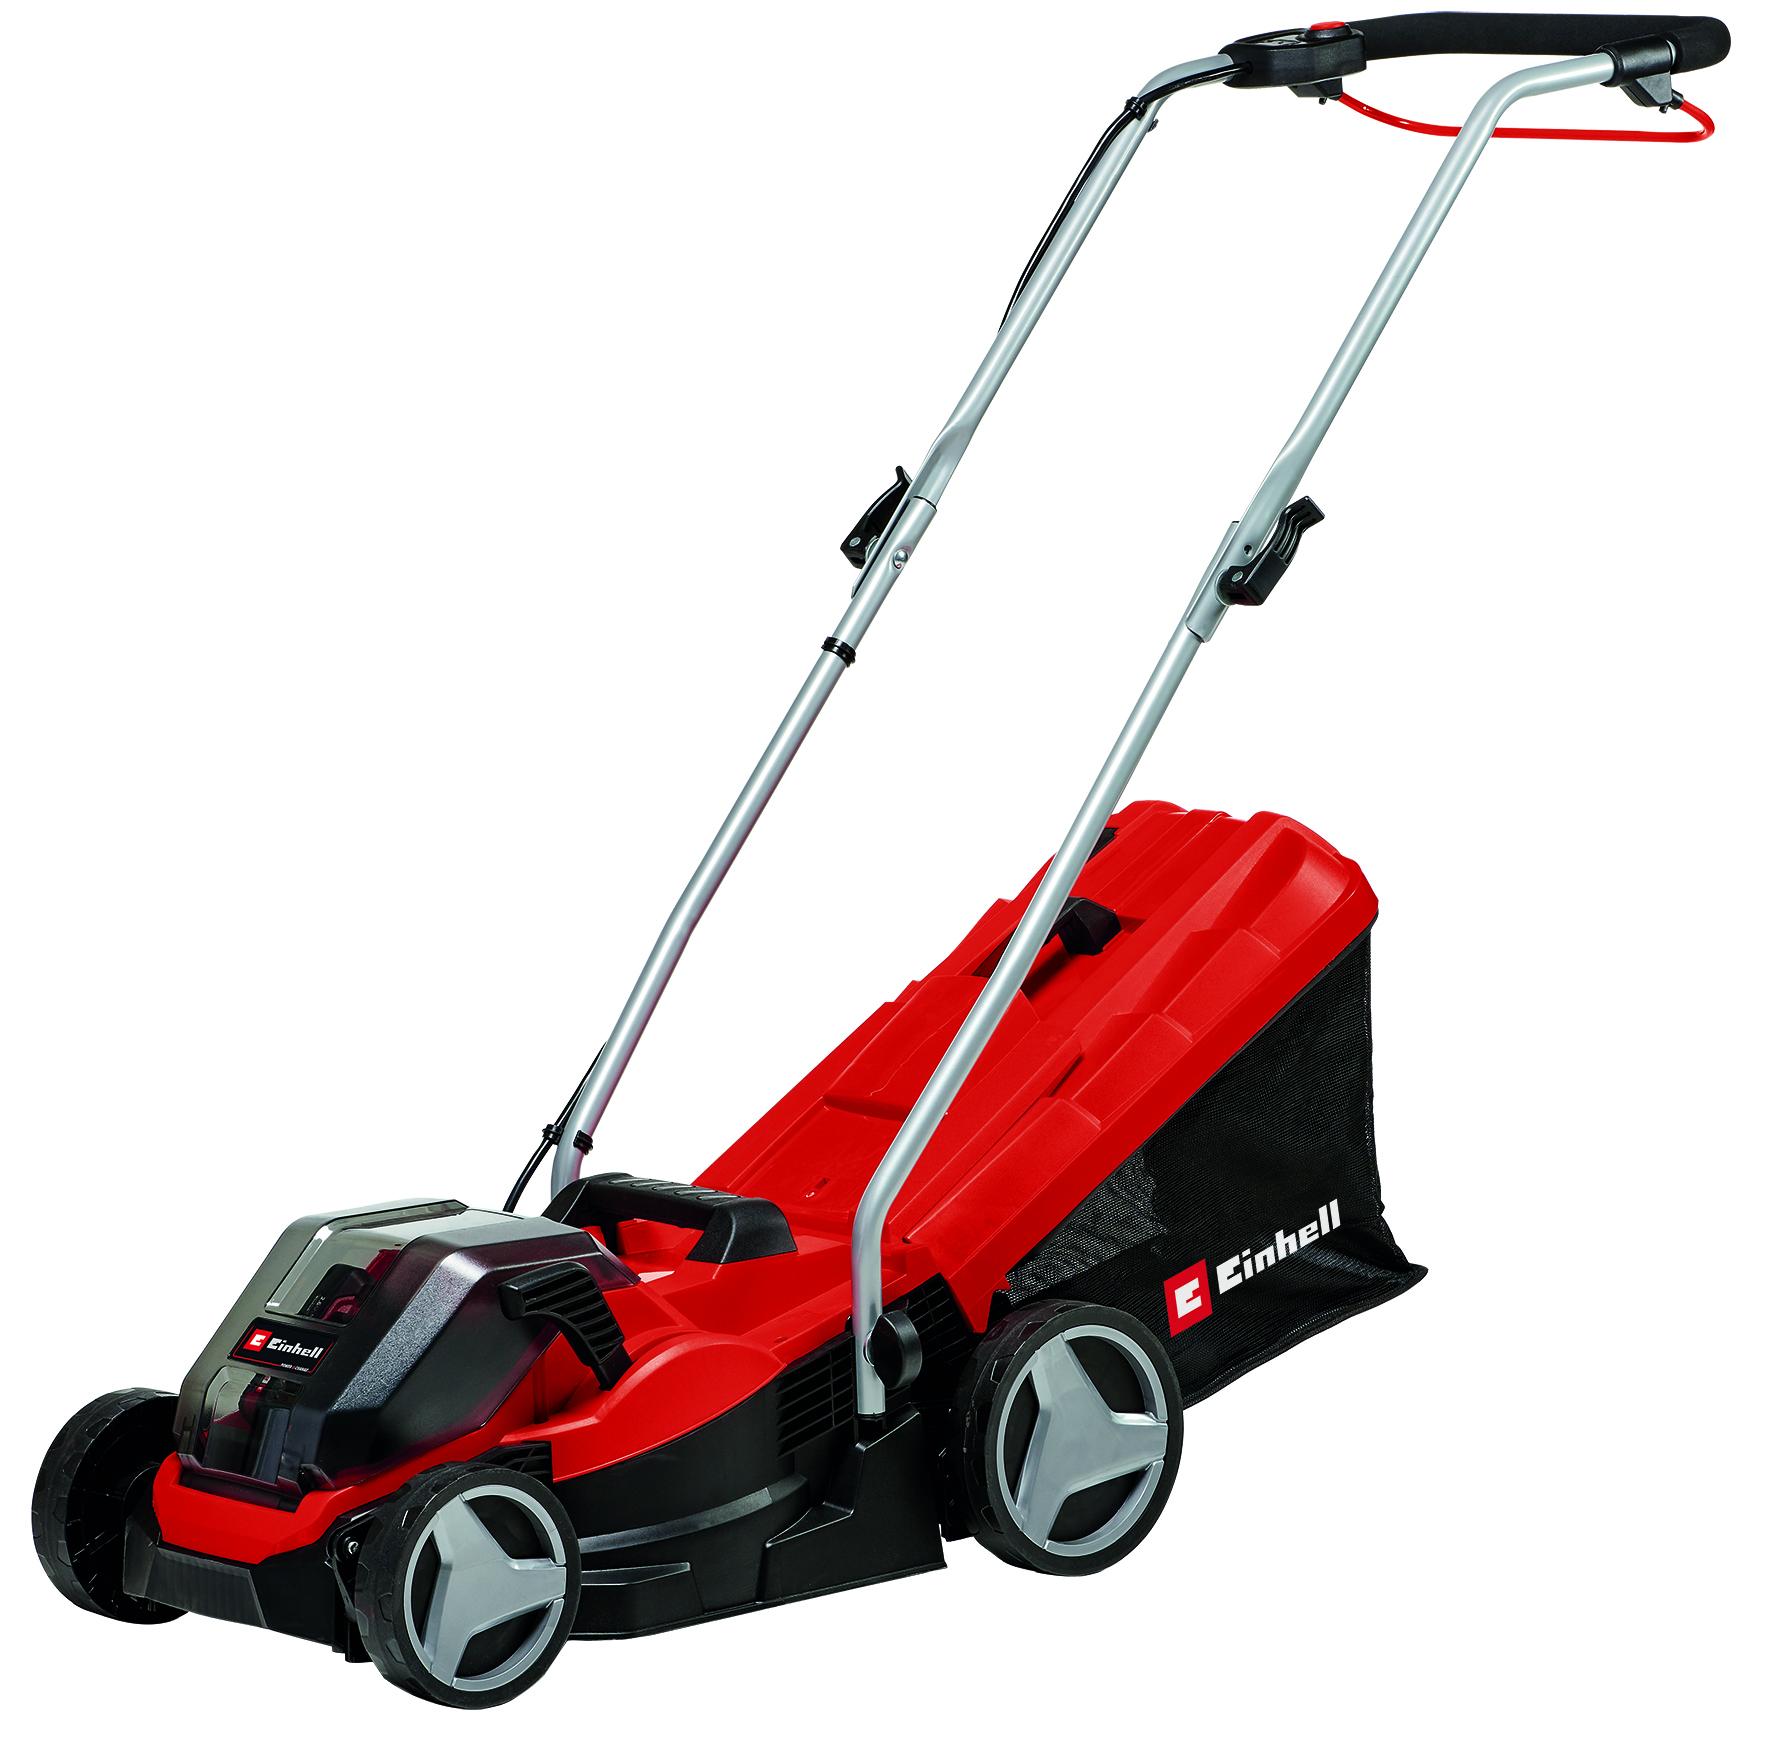 Cordless Lawn Mower, GE-CM 36/33 Li (2x2,5Ah)